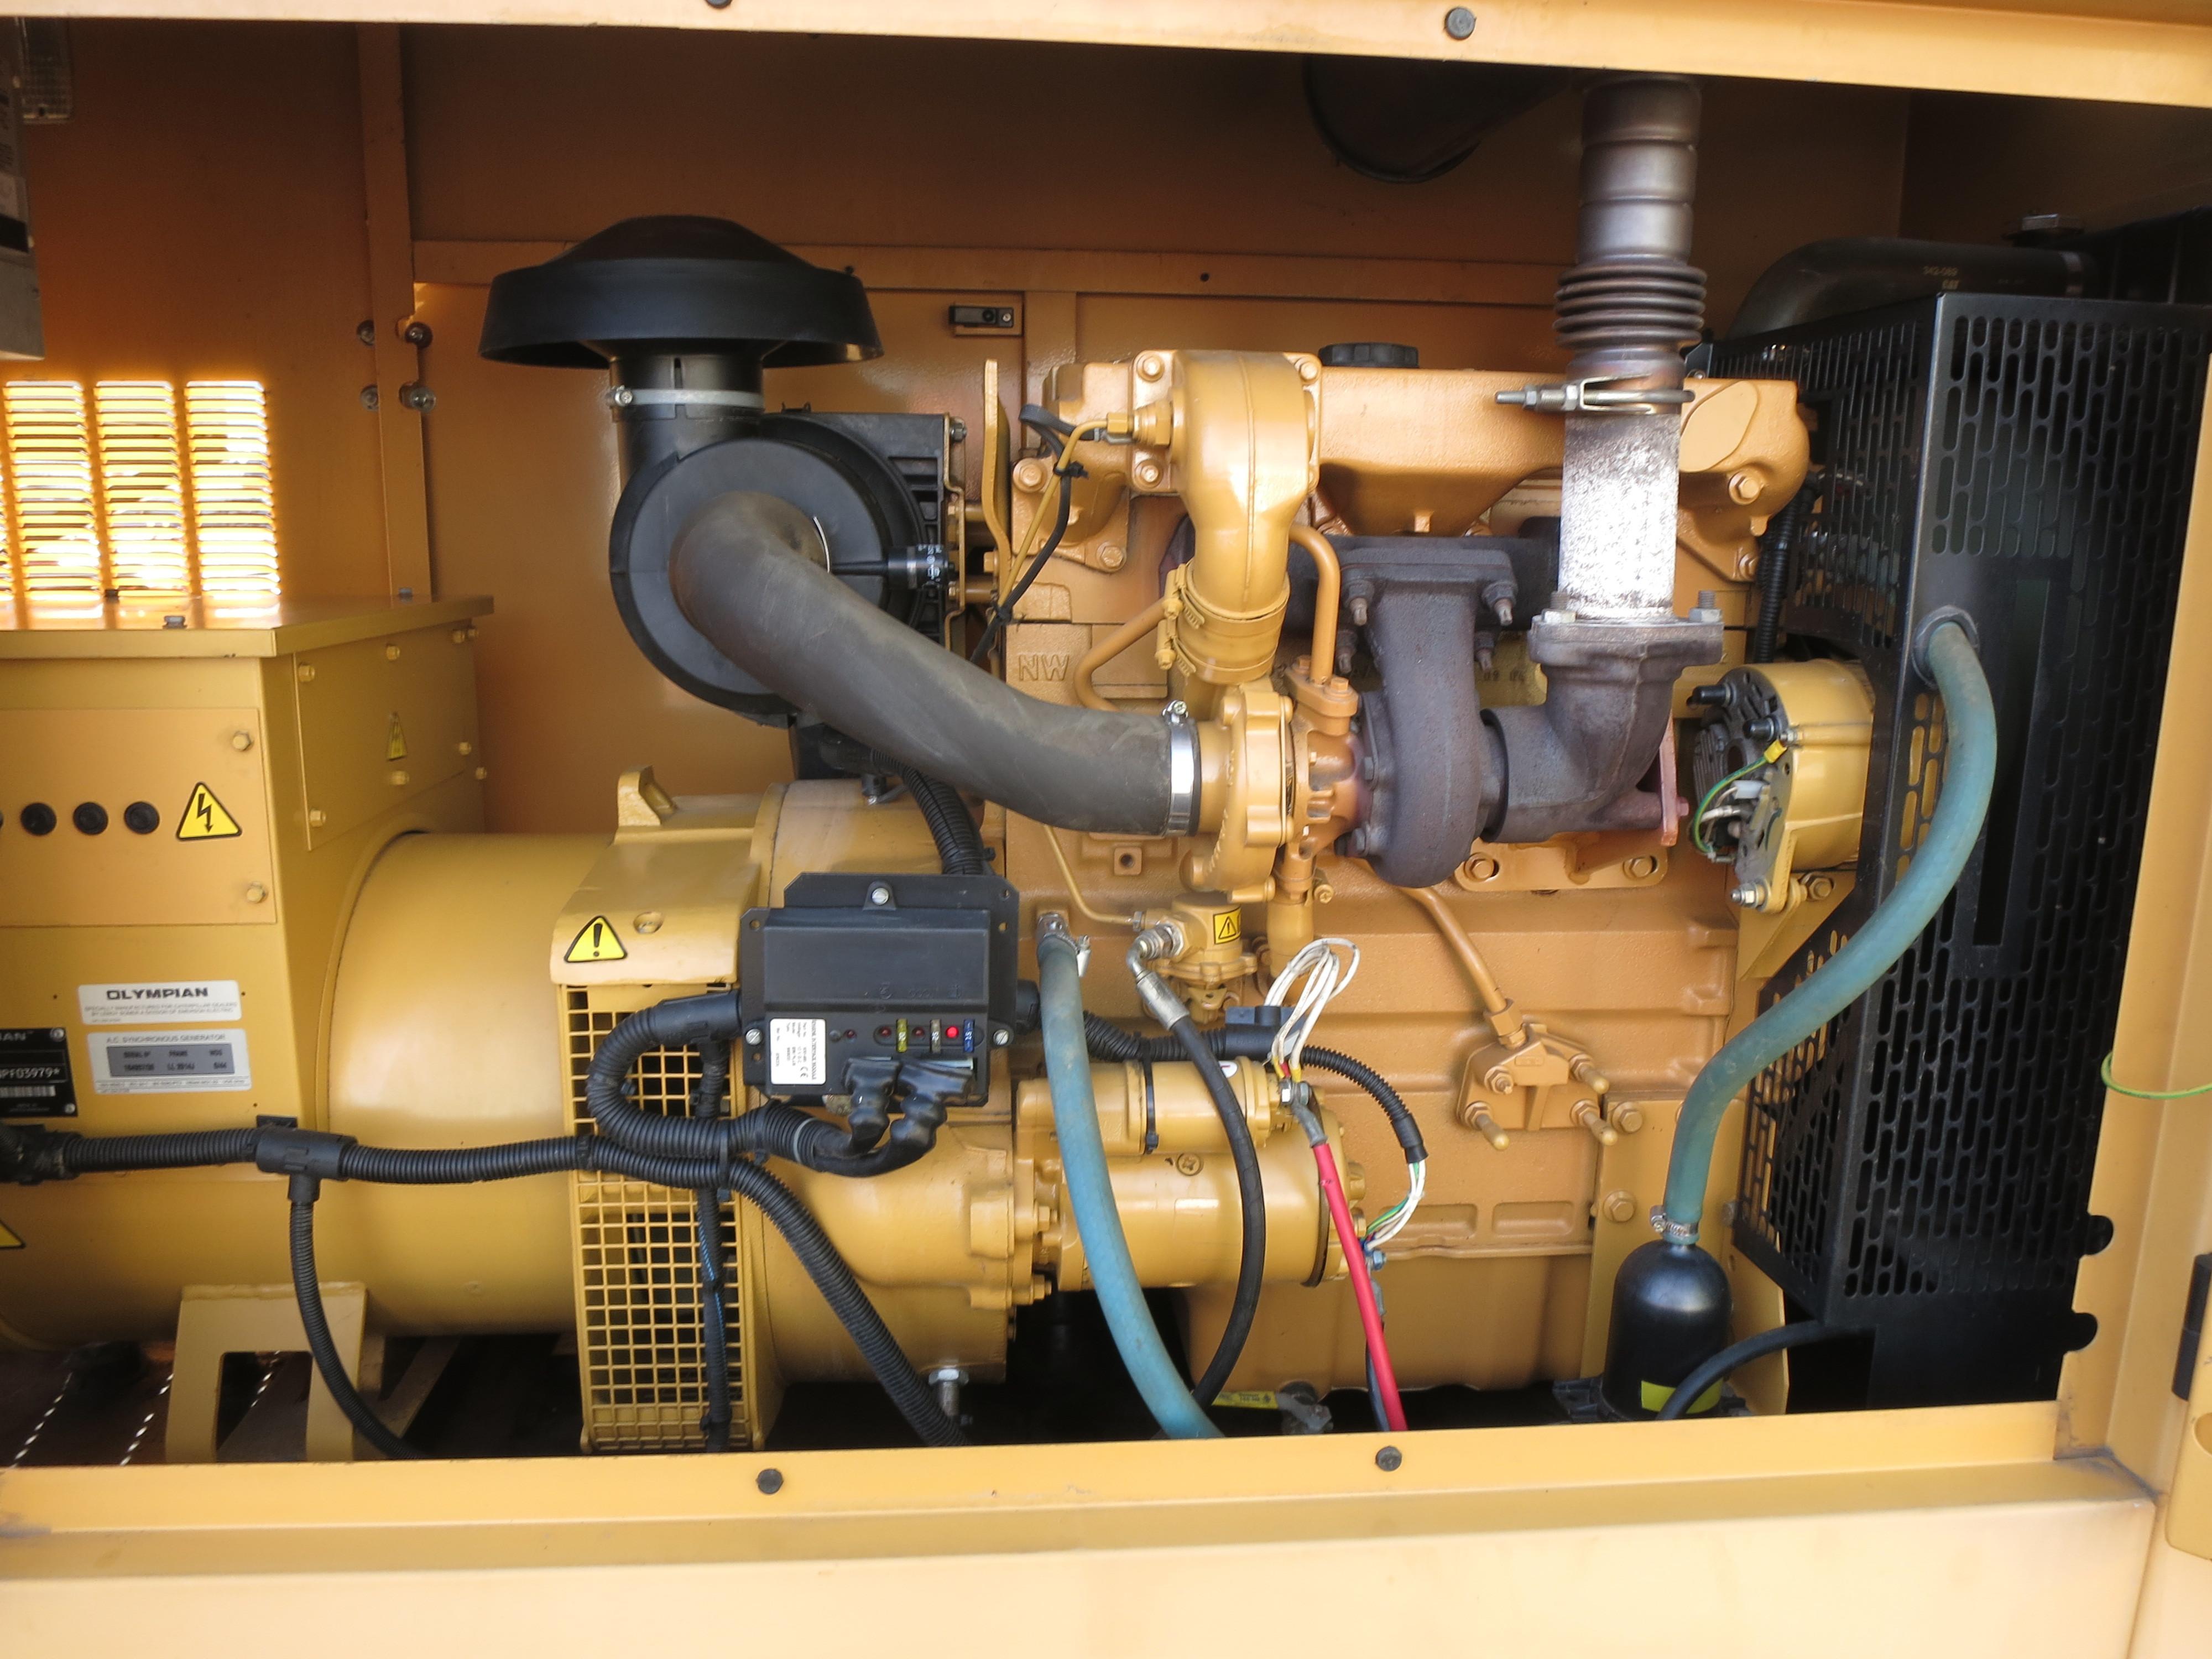 Used Caterpillar D75 P3 Diesel Generator 62 Hrs